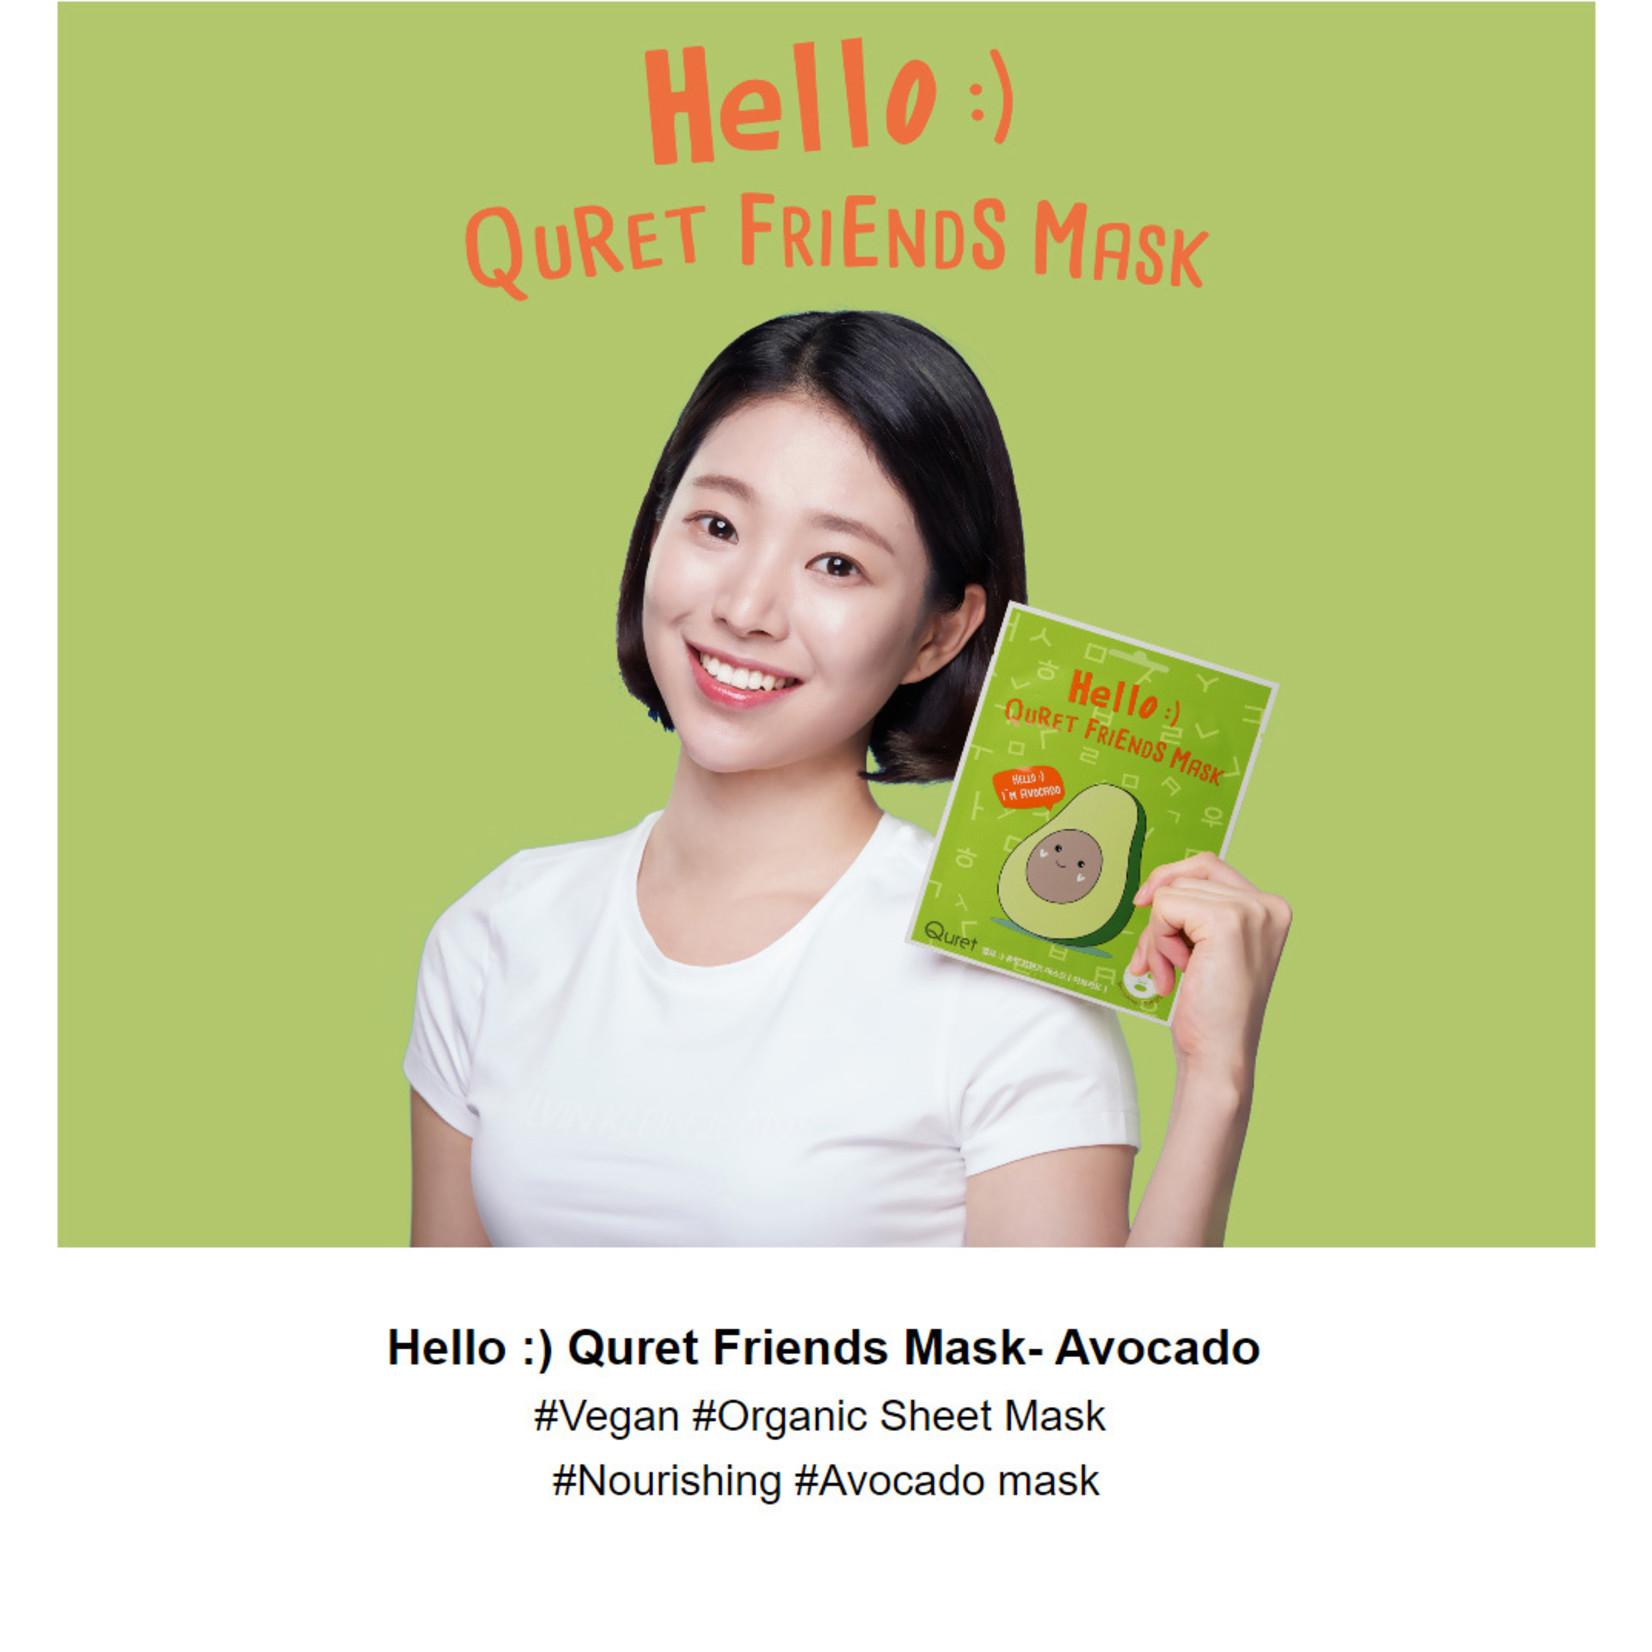 QURET Friends Mask #Avocado